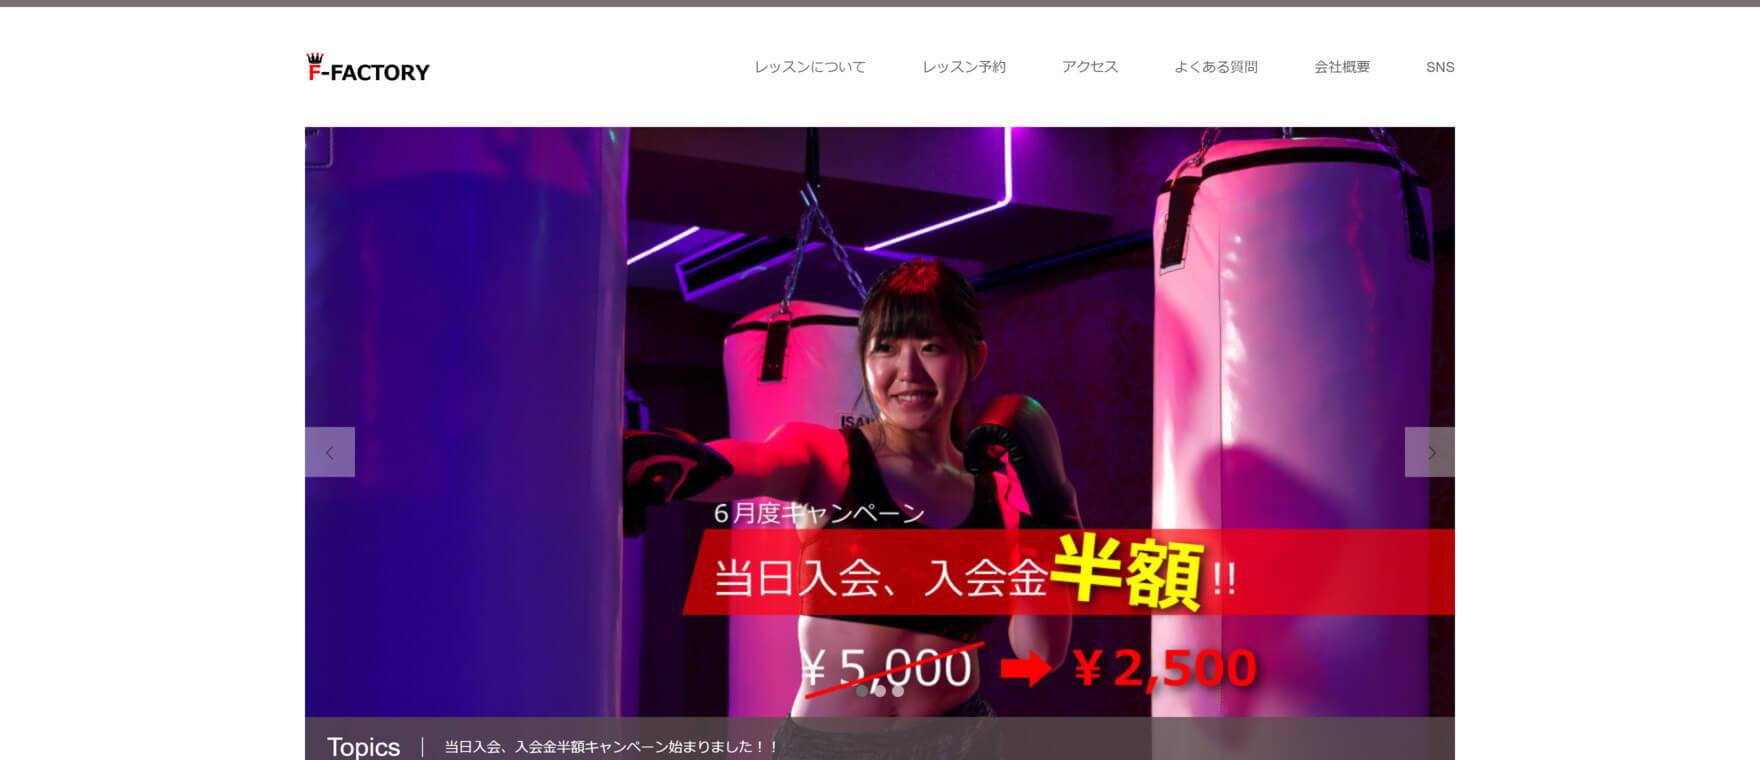 F-FACTORY静岡鷹匠店のイメージ画像